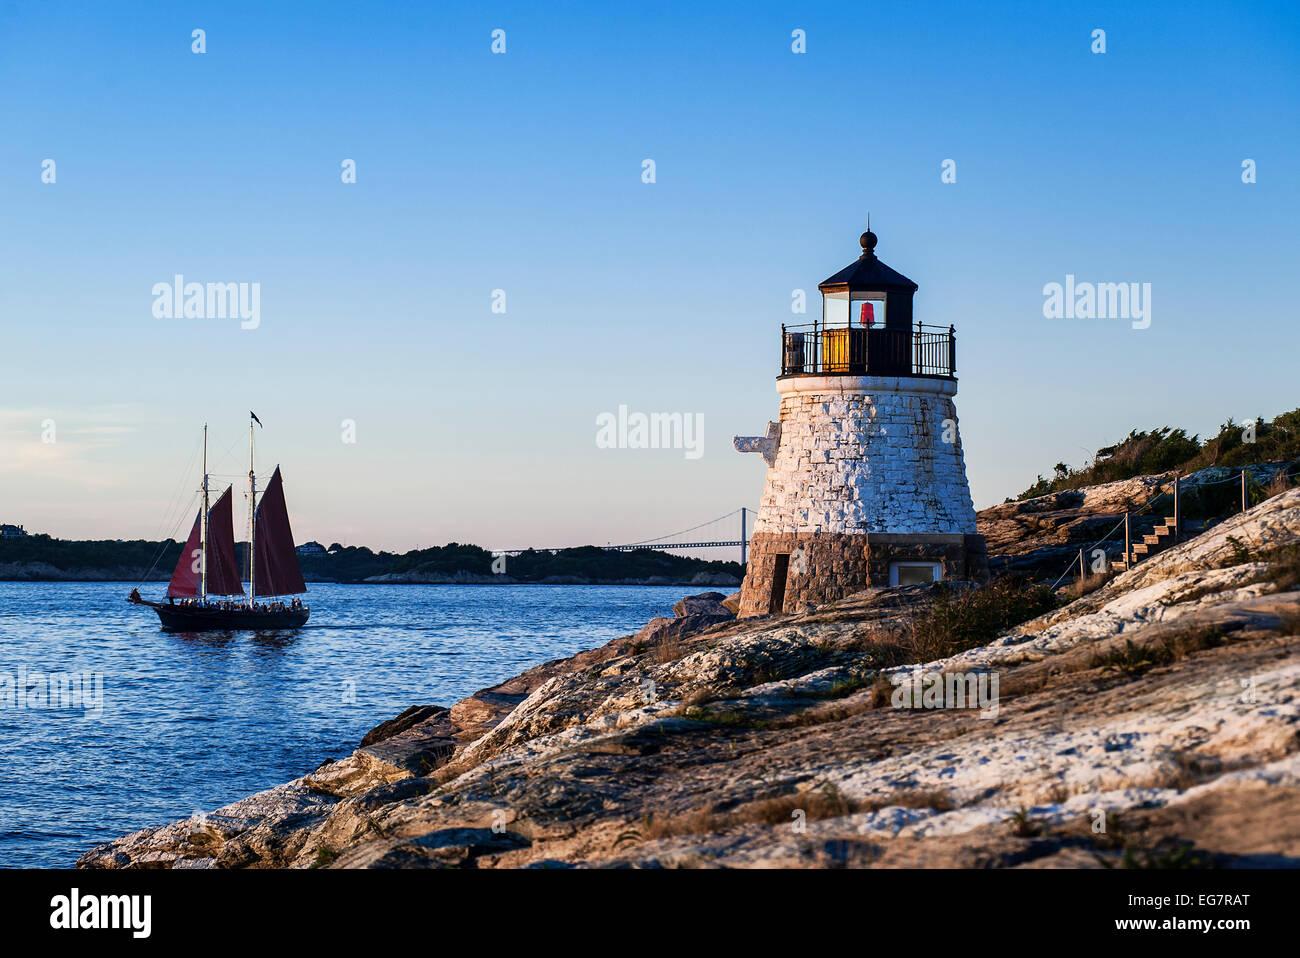 Castle Hill Lighthouse Overlooking Narragansett Bay